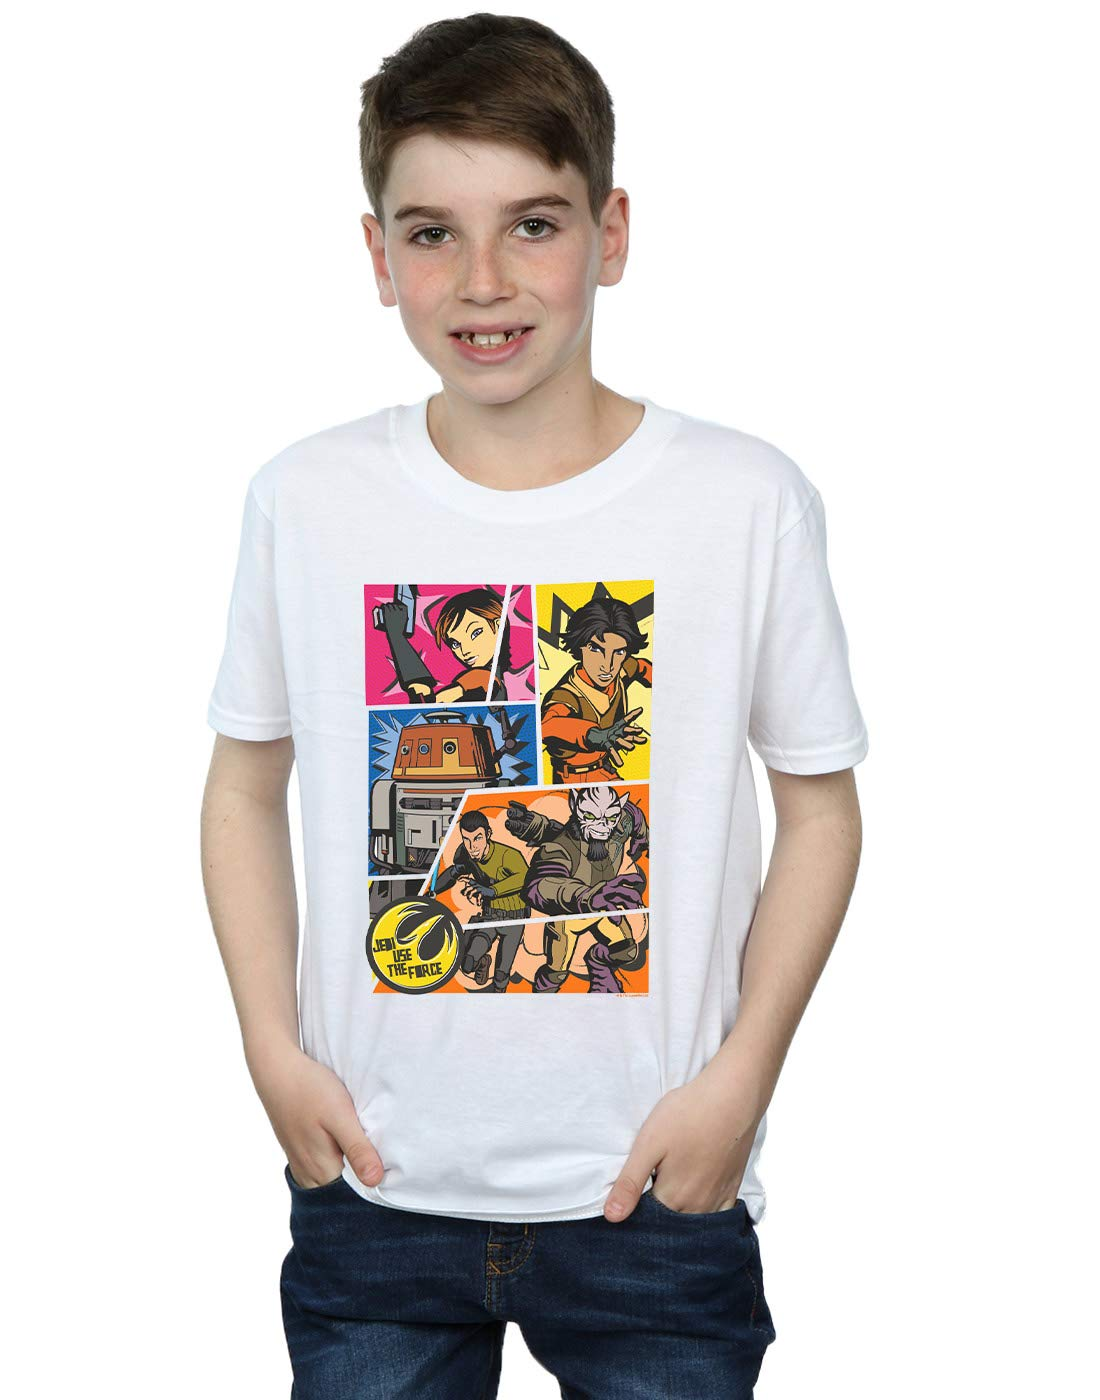 Star Wars Rebels Comic Strip Tshirt